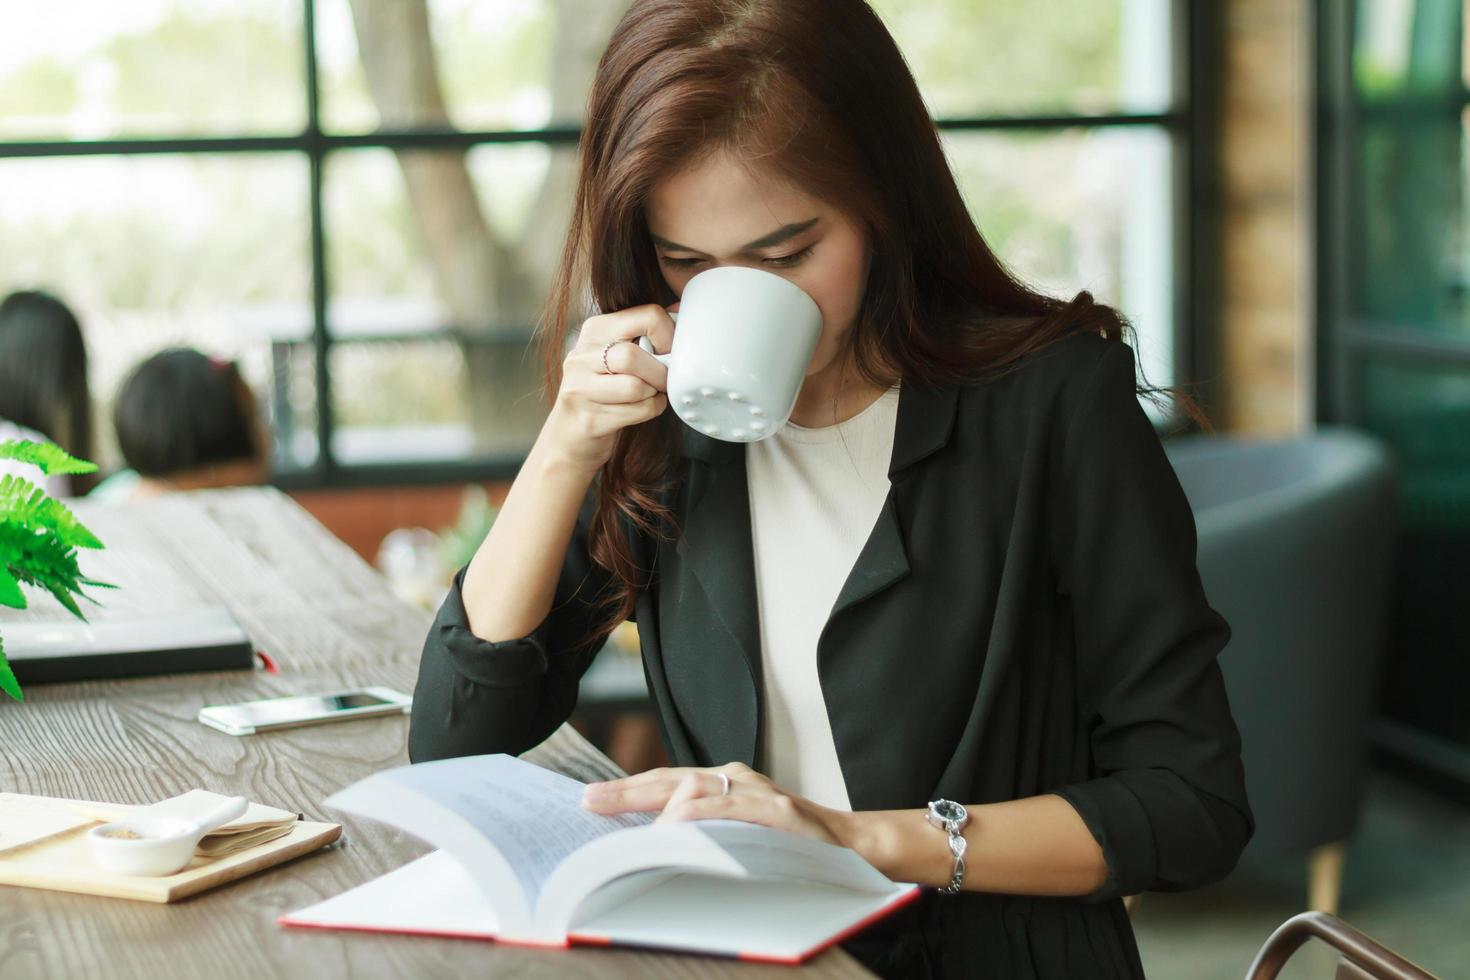 donna asiatica di affari che legge e che beve caffè foto